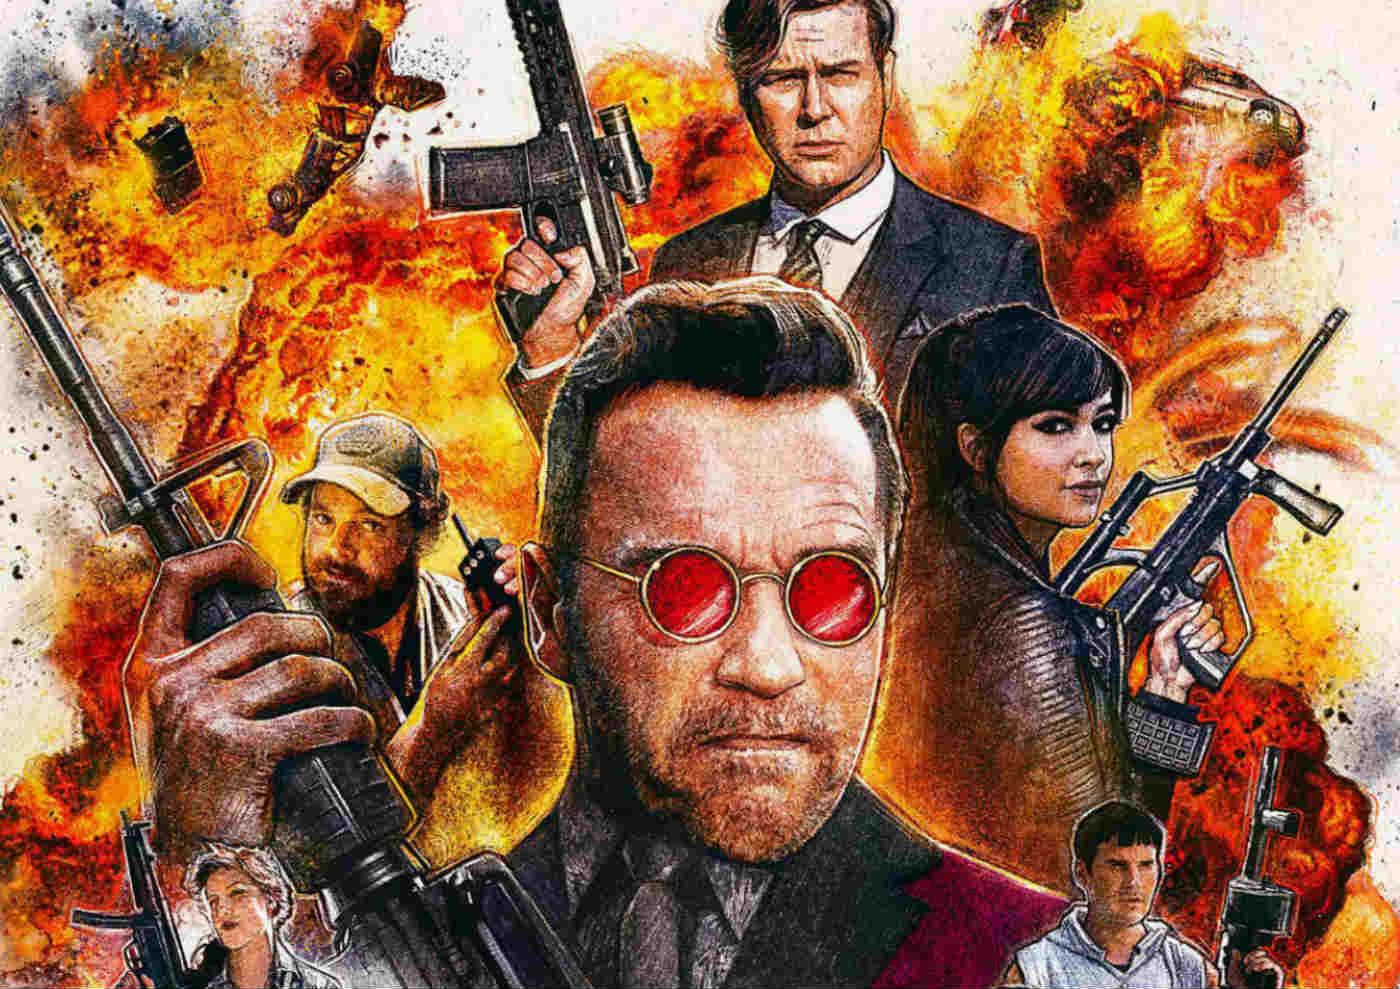 Watch Schwarzenegger Play it for Laughs in Killing Gunther Trailer